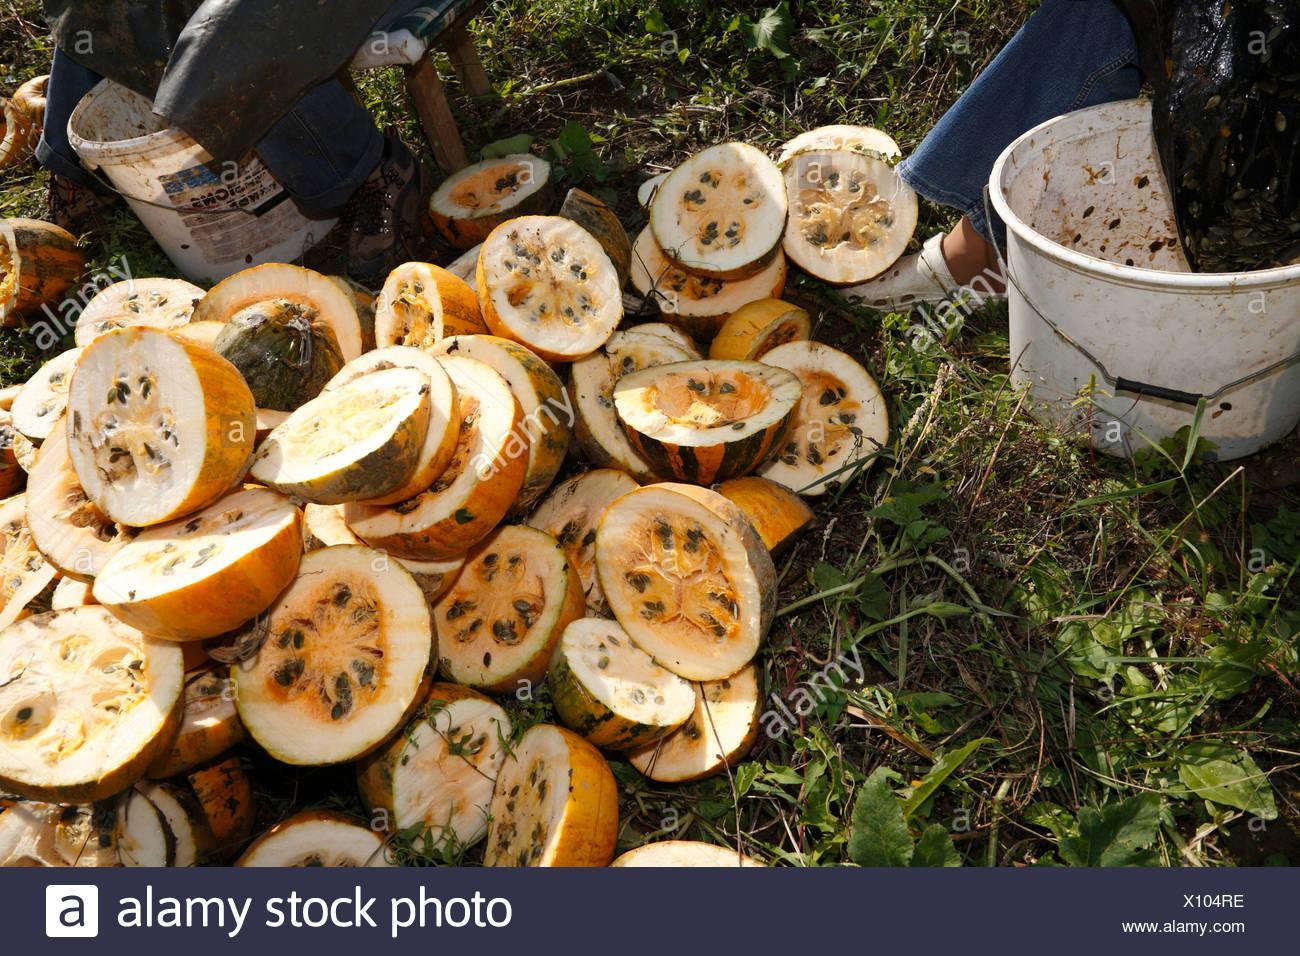 Harvesting of pumpkin seeds in Leutschach, Styria, Austria, Europe Stock Photo